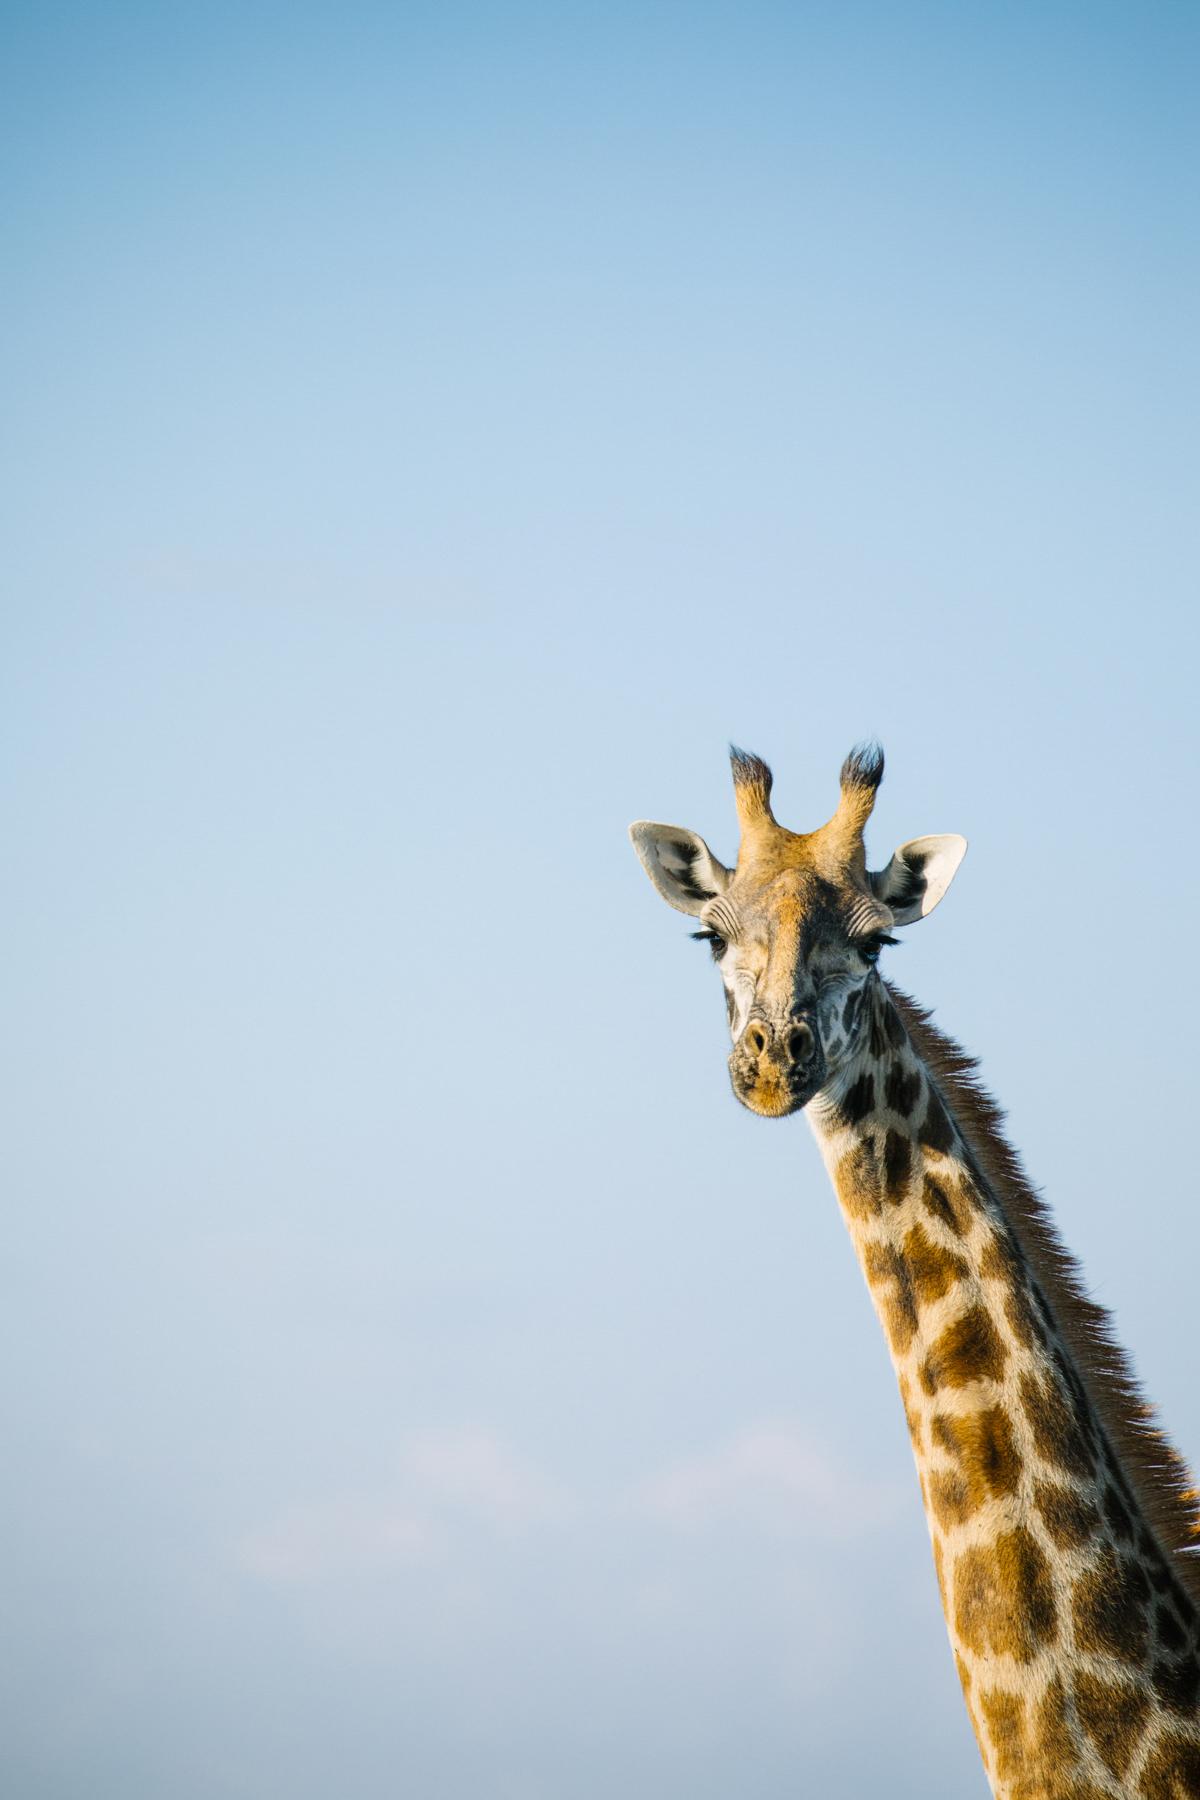 KenyaFeb2019_Safari-106.jpg